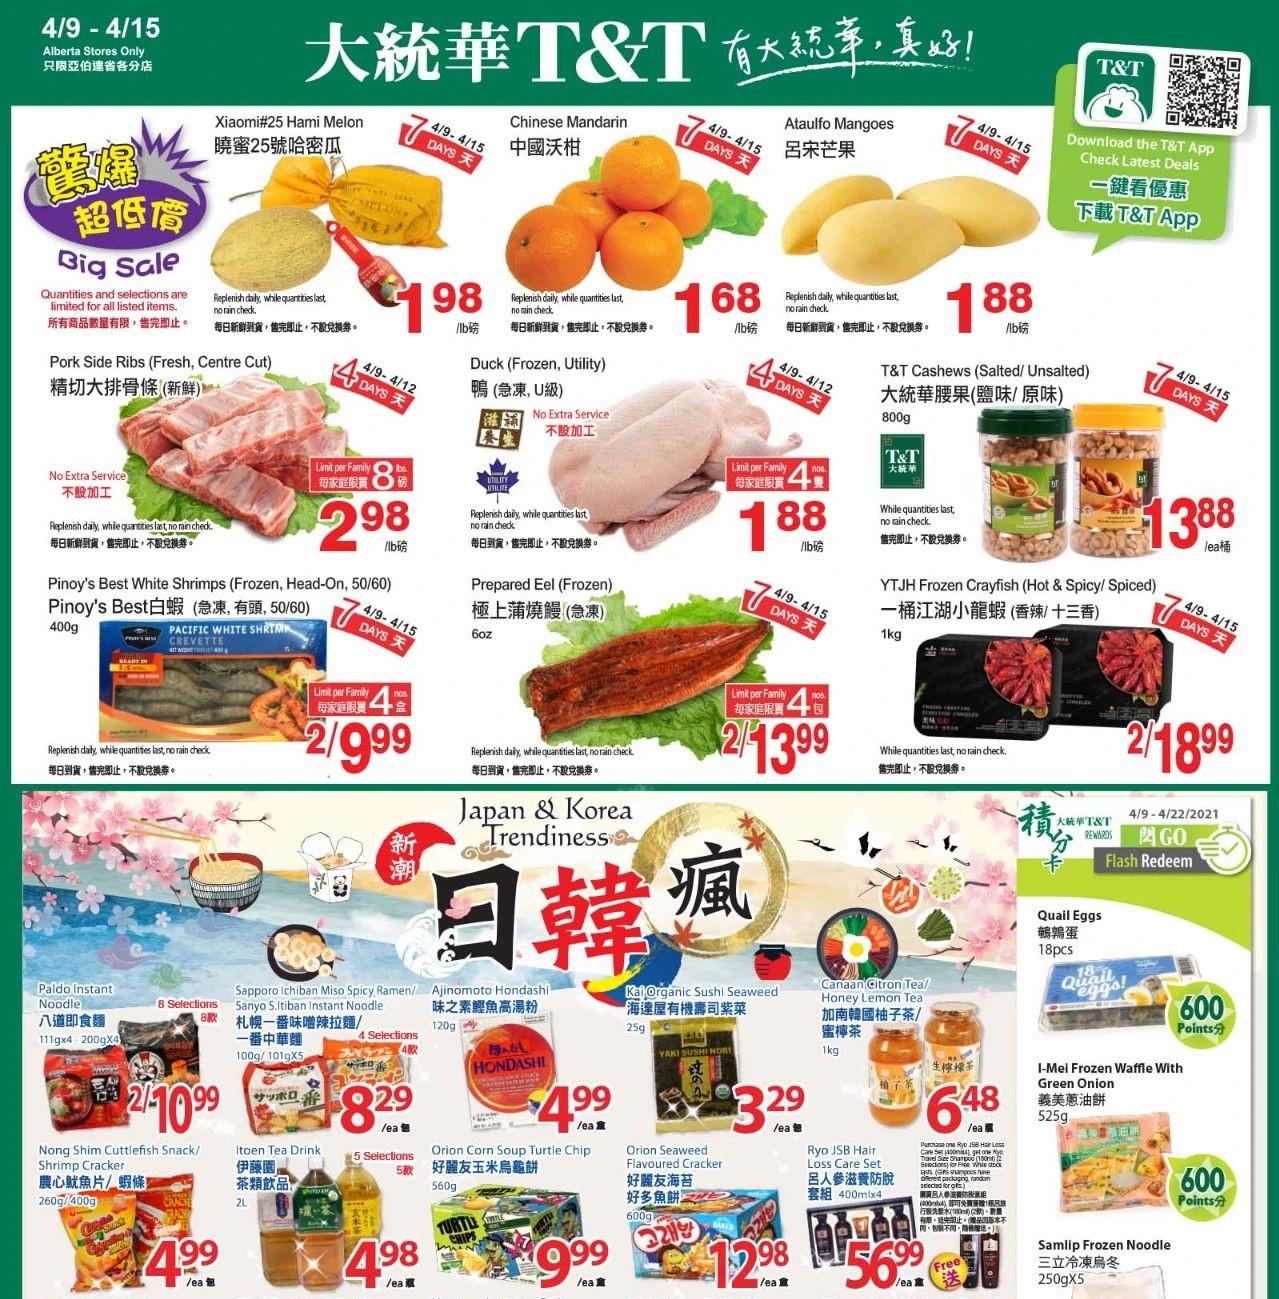 TNT Supermarket Flyer Apr 9